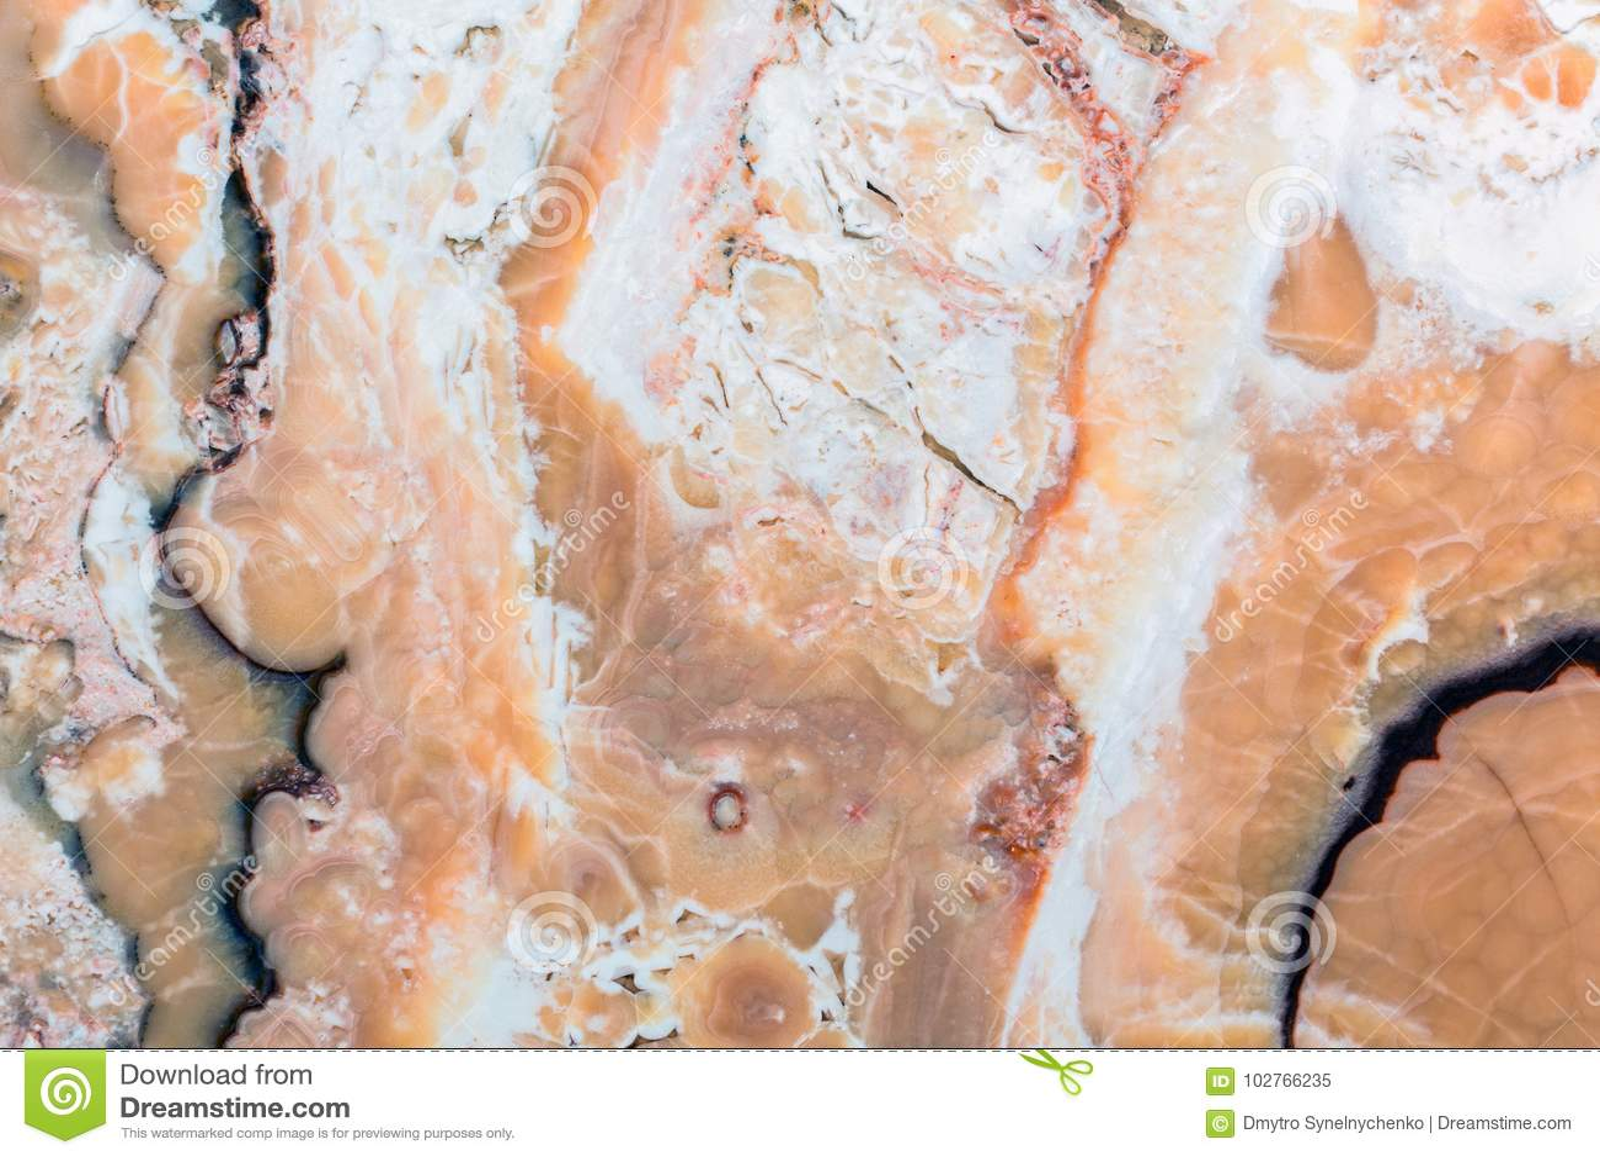 Onyks, unikalna tekstura naturalny kamień